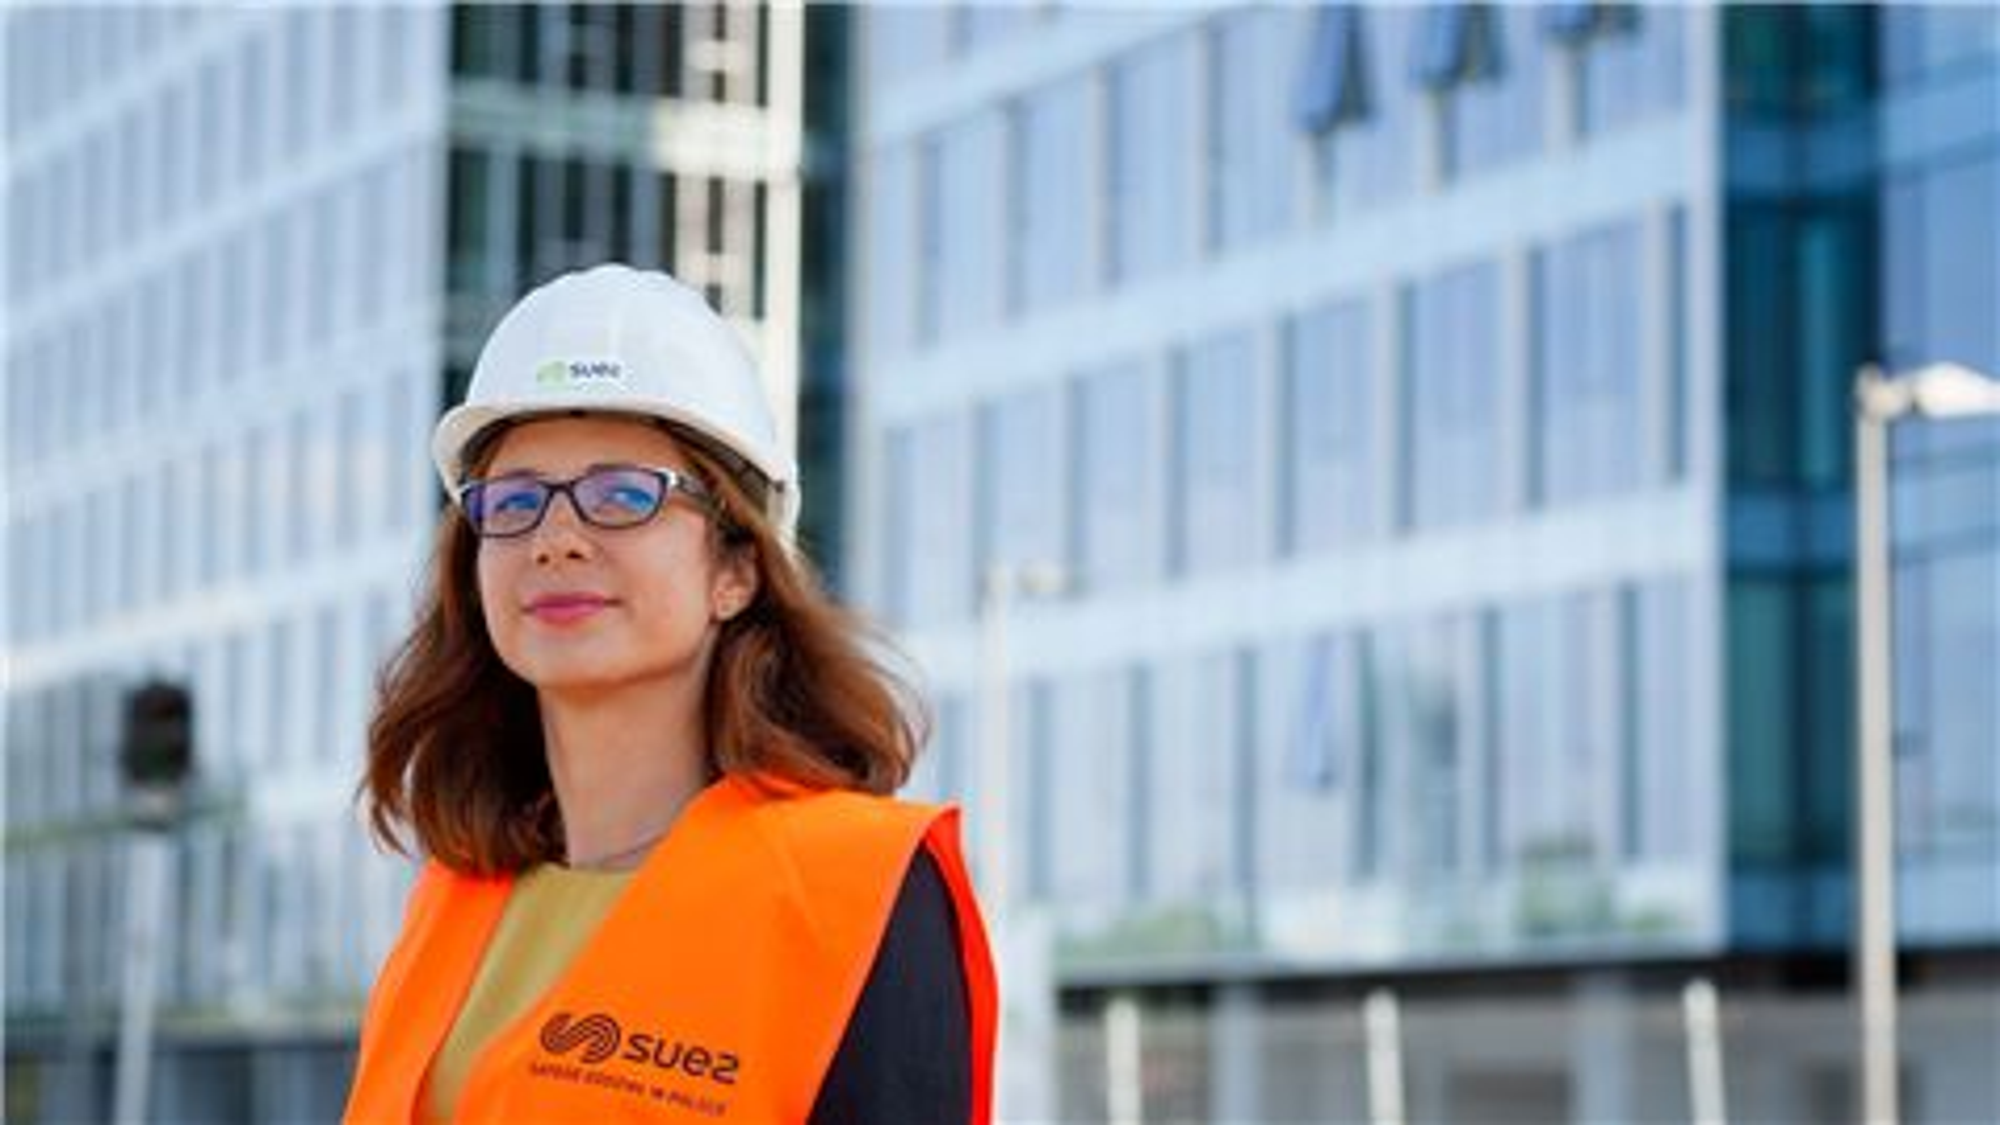 Employee Consulting Warsaw Poland SUEZ